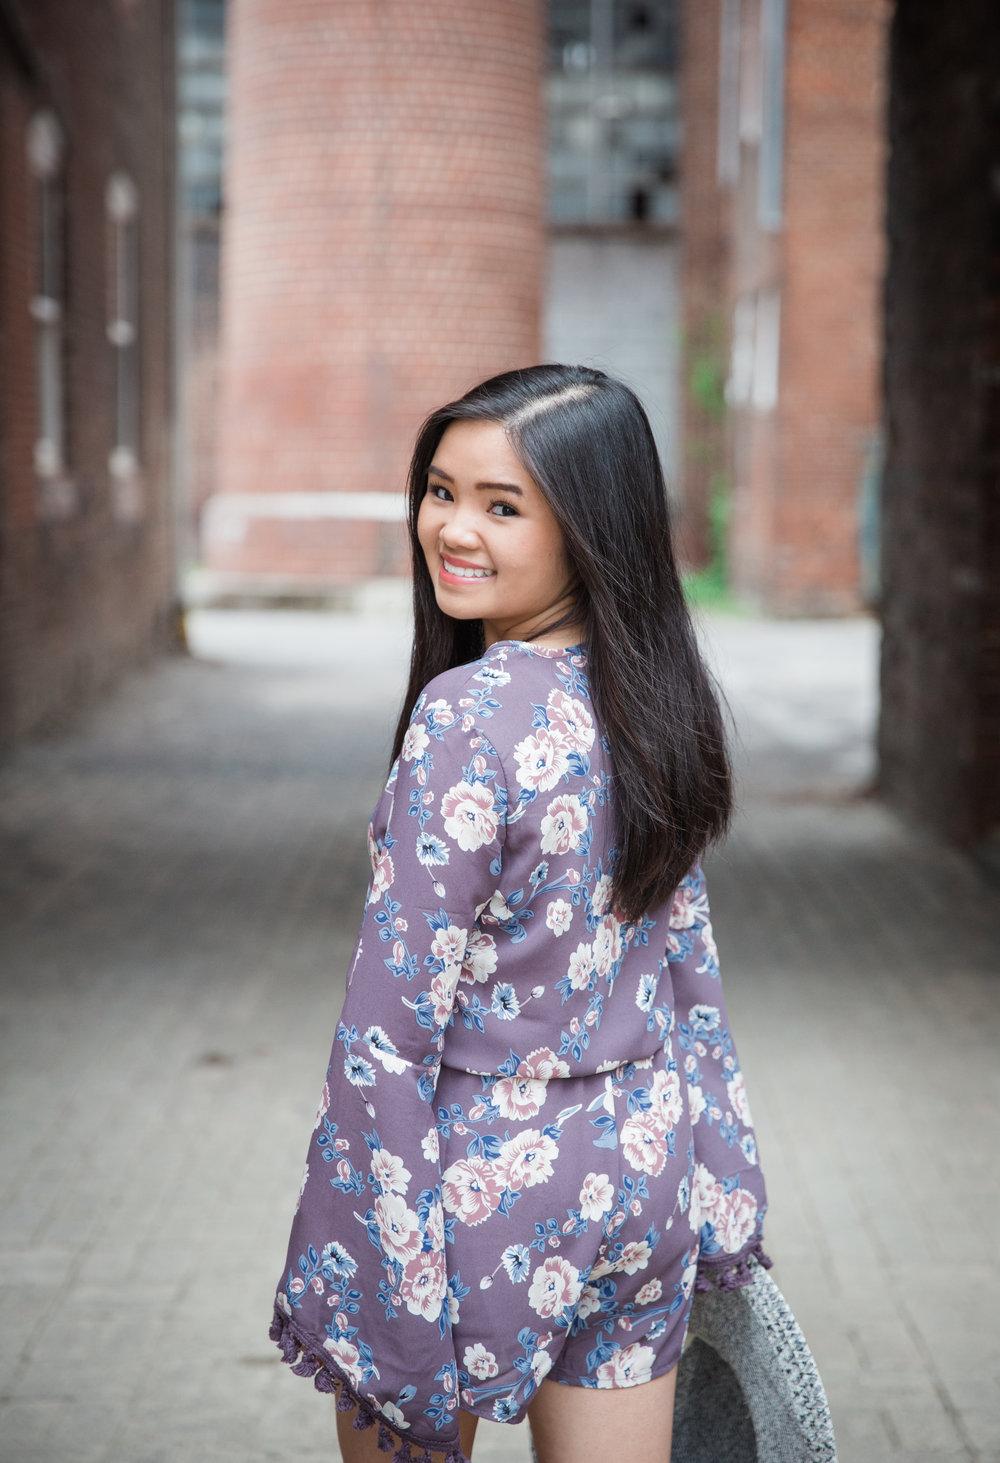 jasmine 10 of 24.jpg